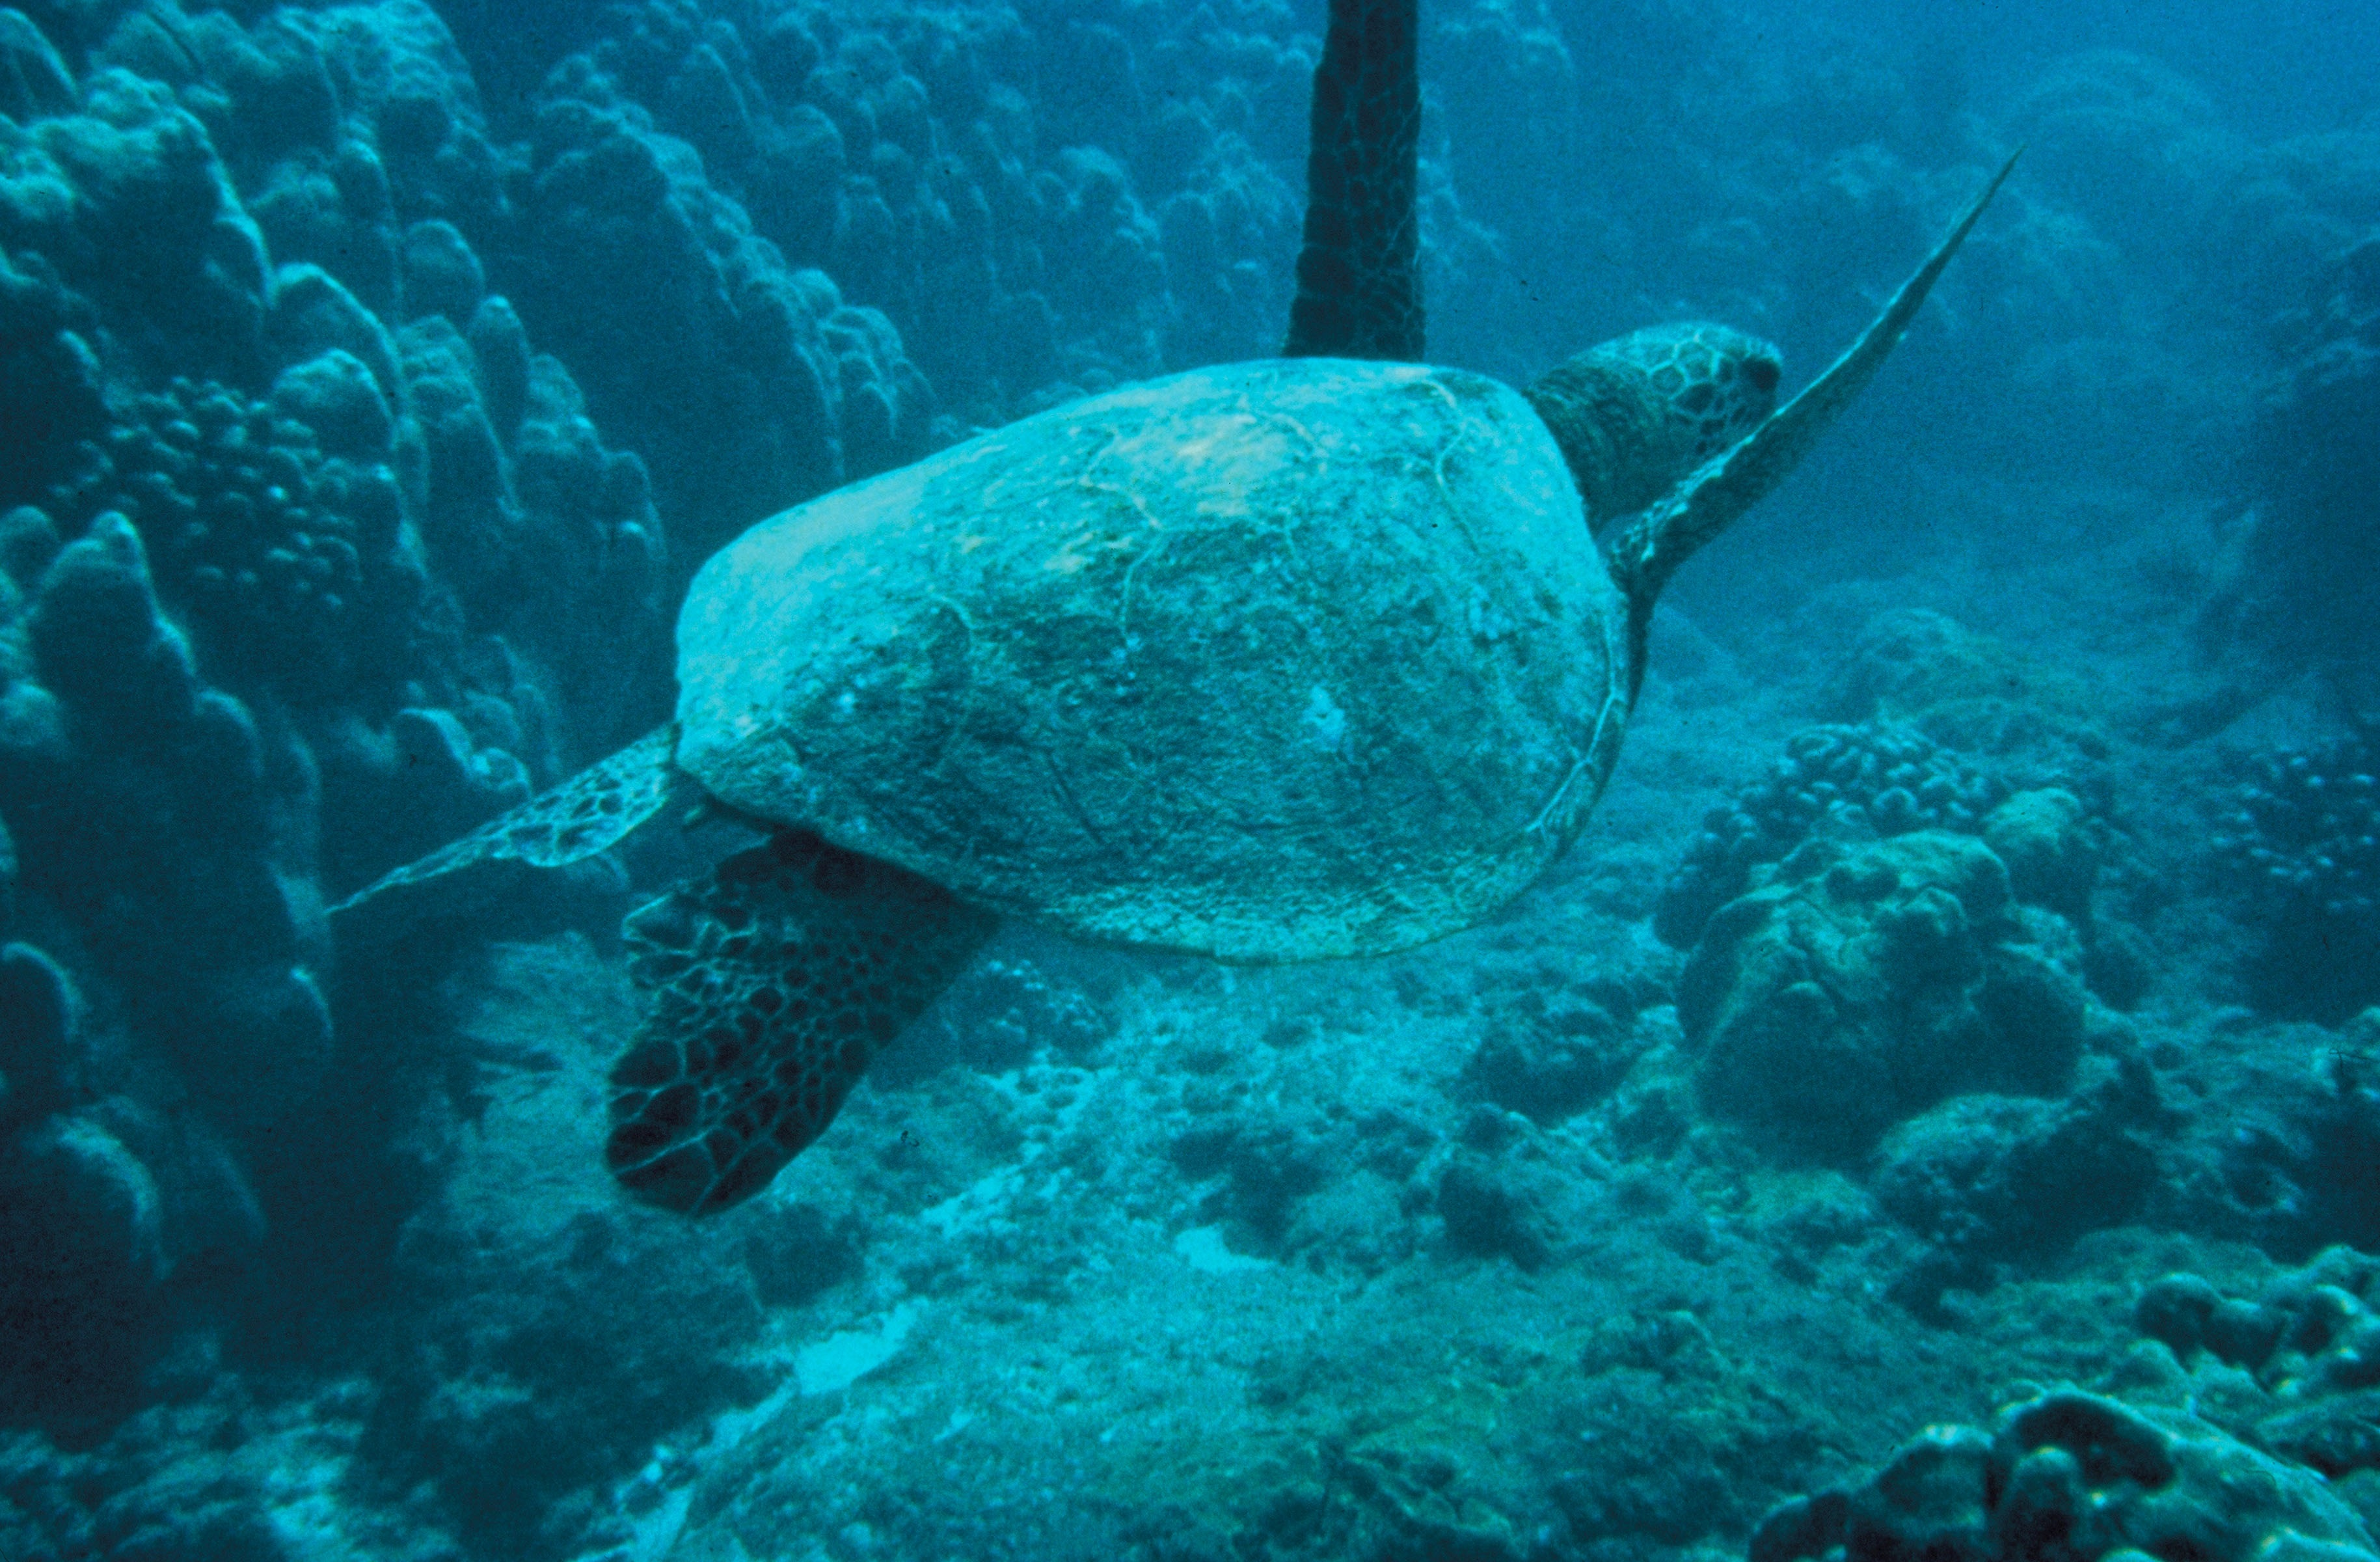 Turtle in the sea photo